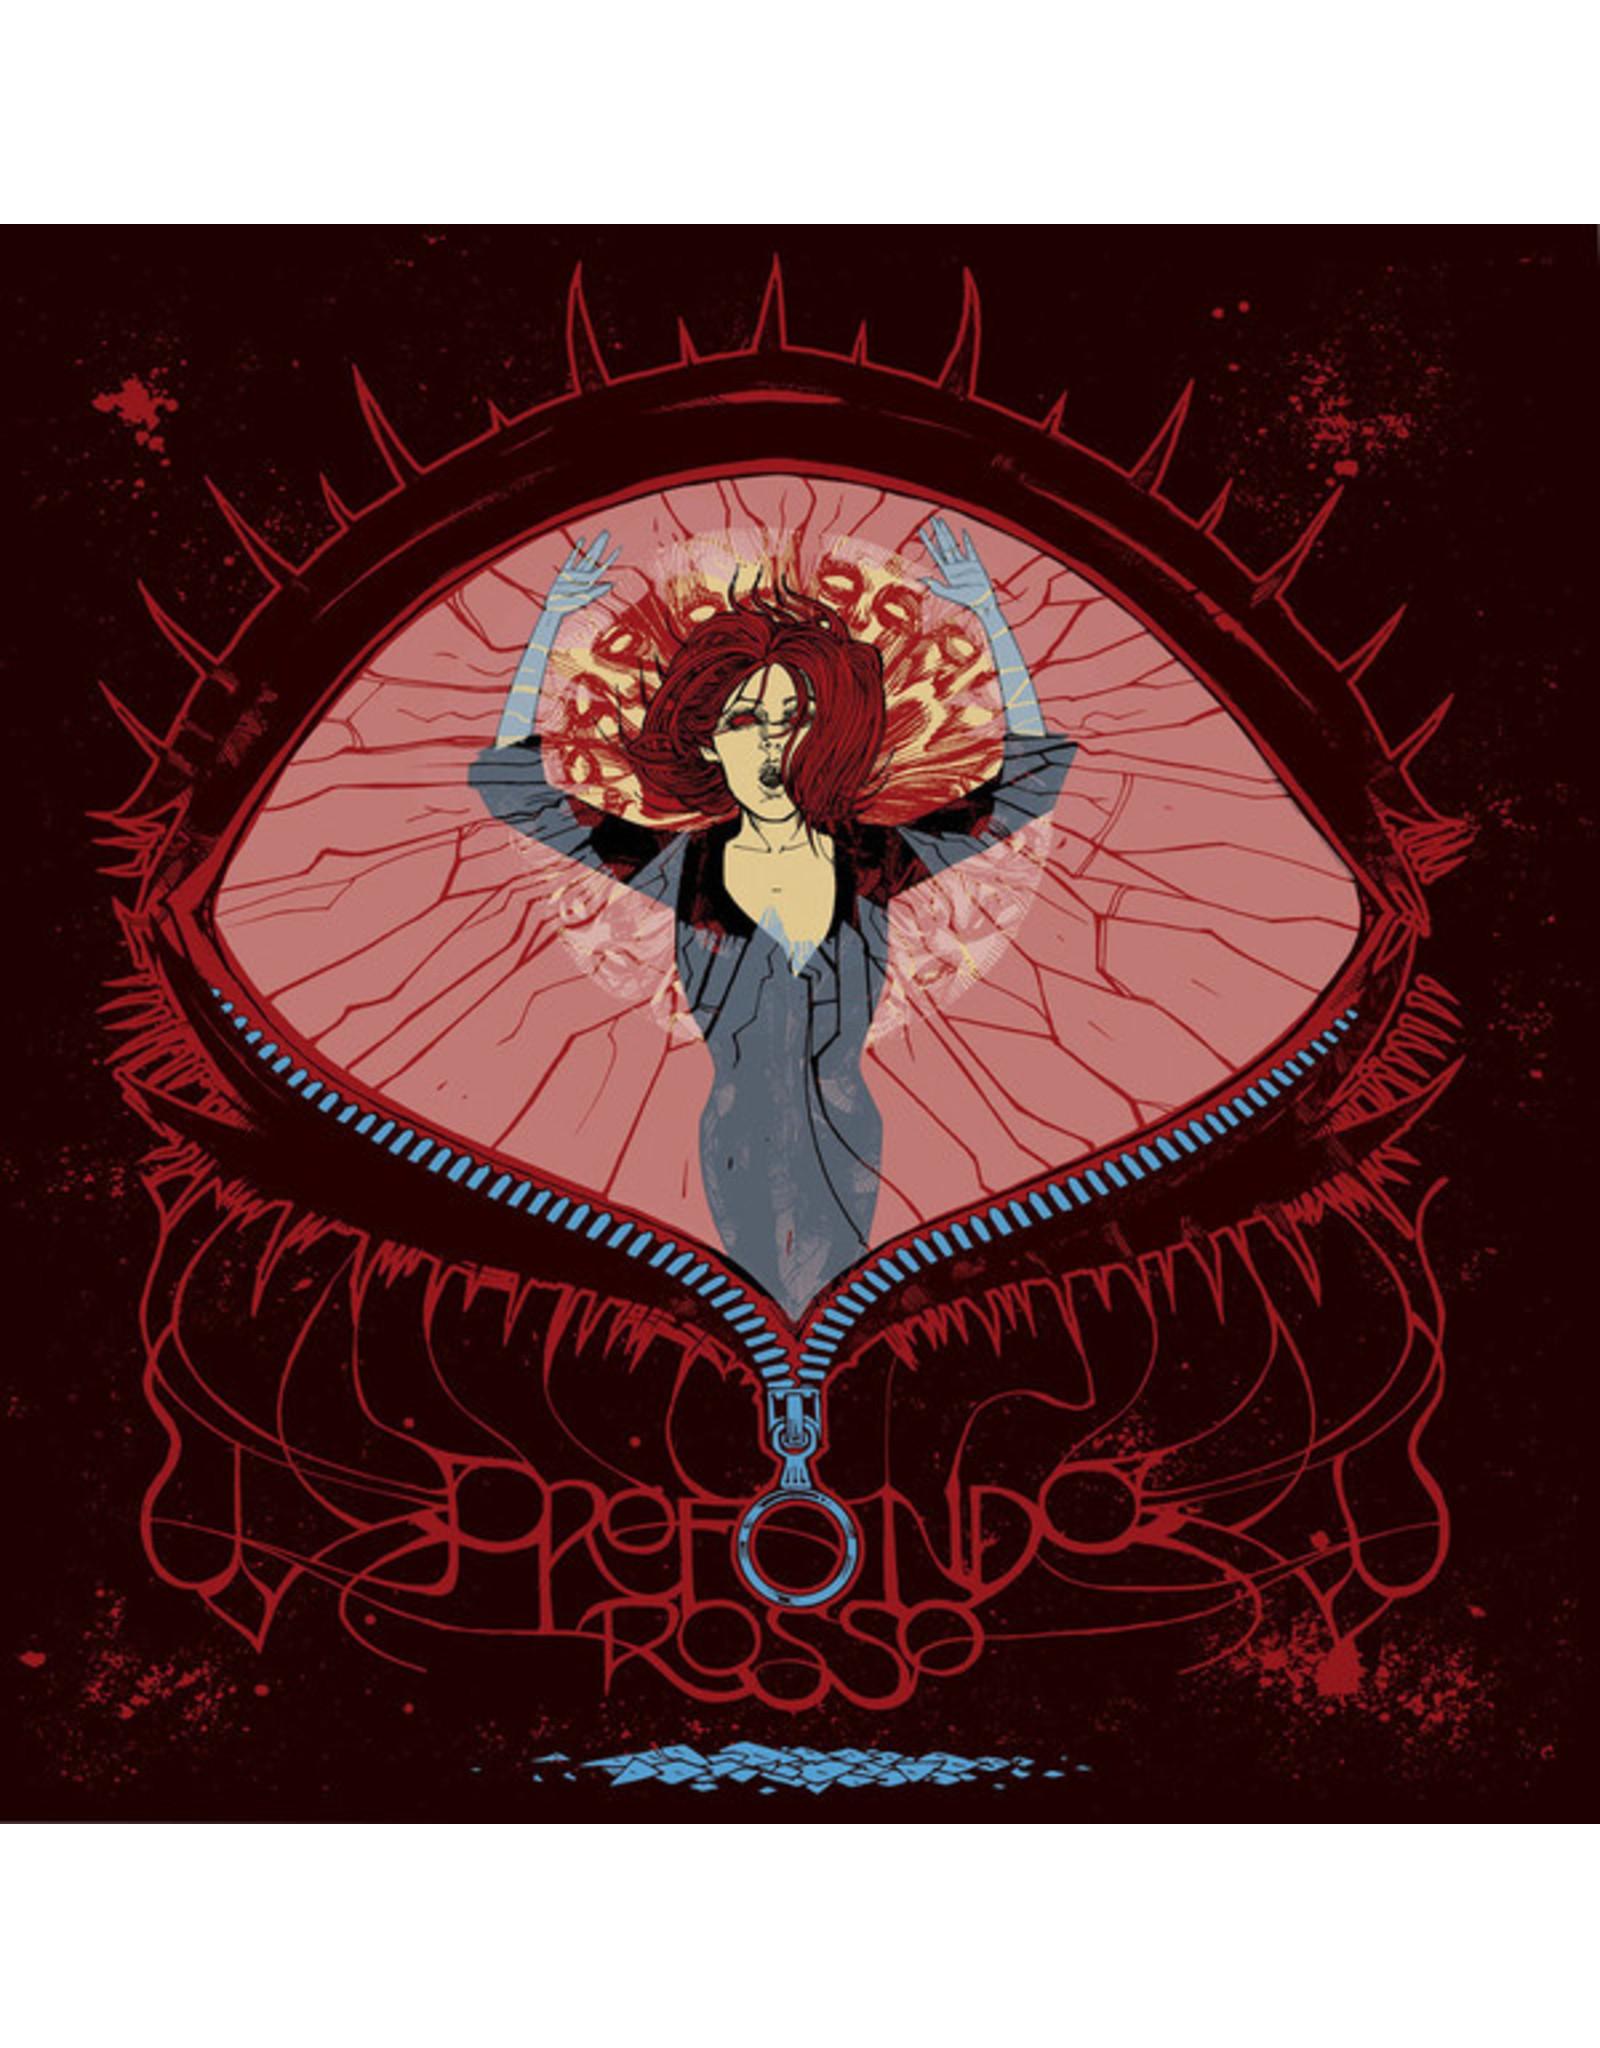 New Vinyl Goblin - Profondo Rosso OST 3LP